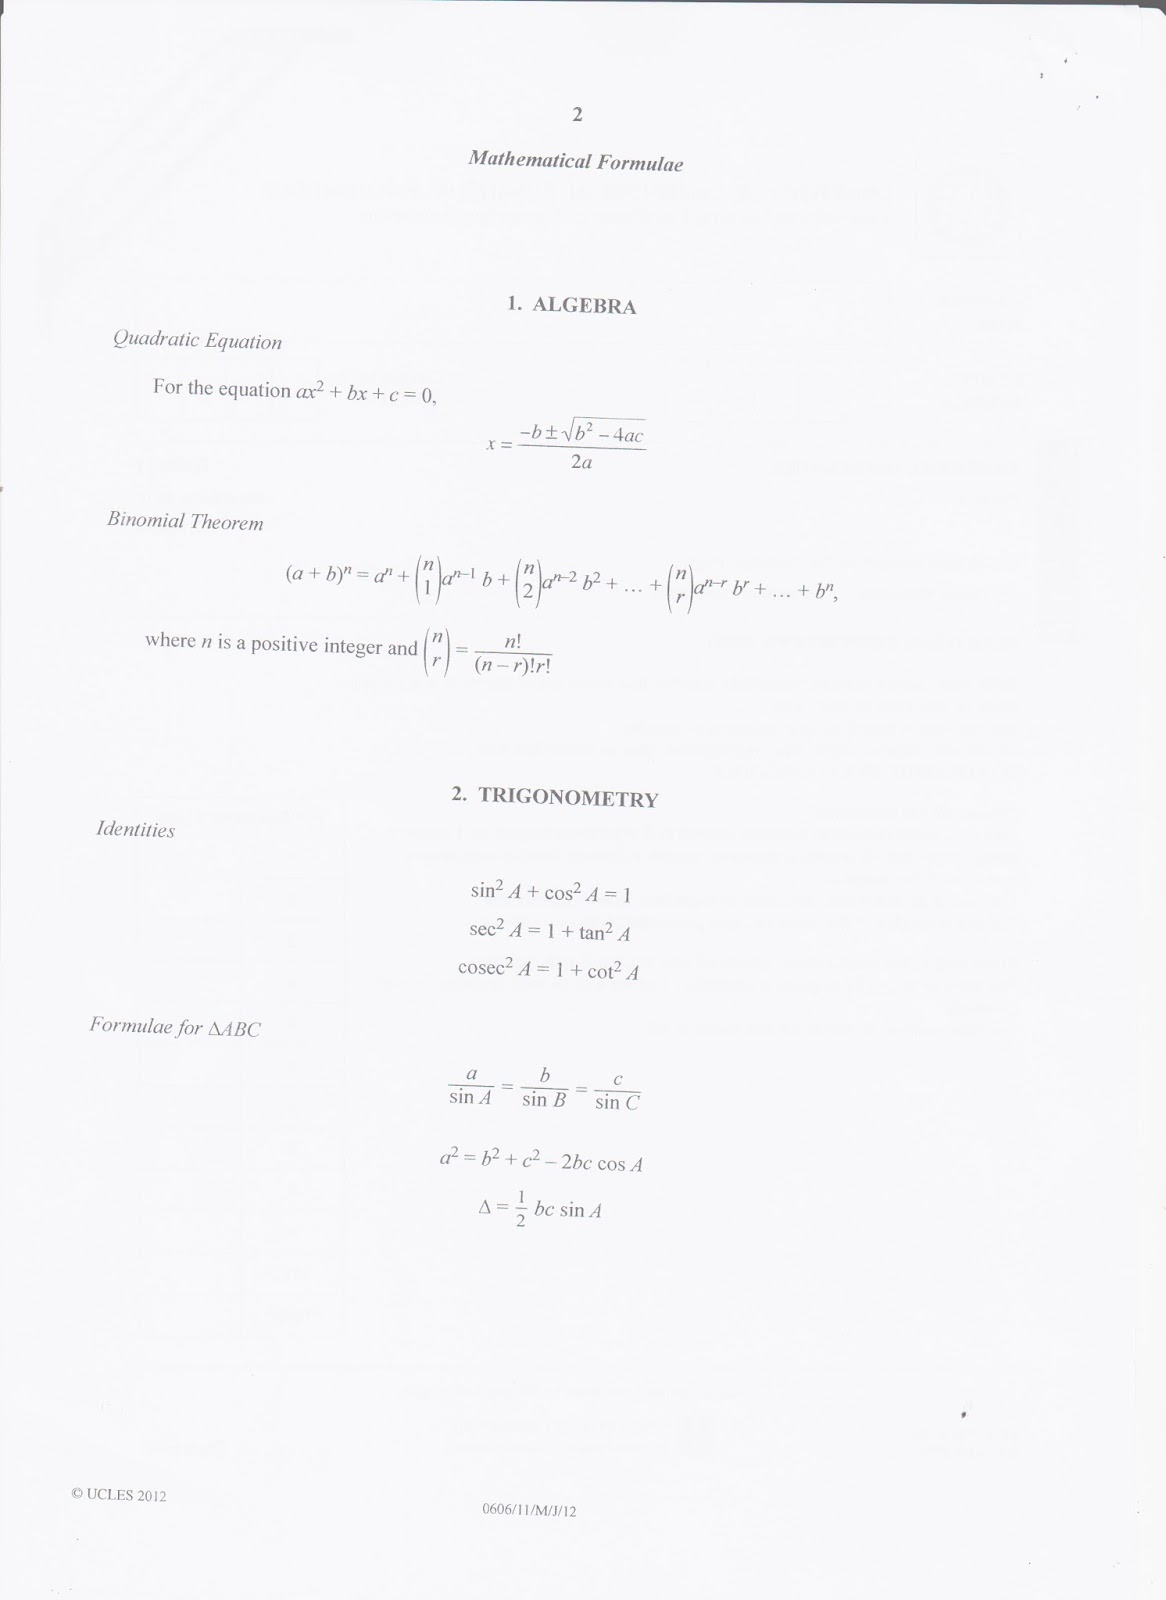 Madison : Xtremepapers additional mathematics 0606